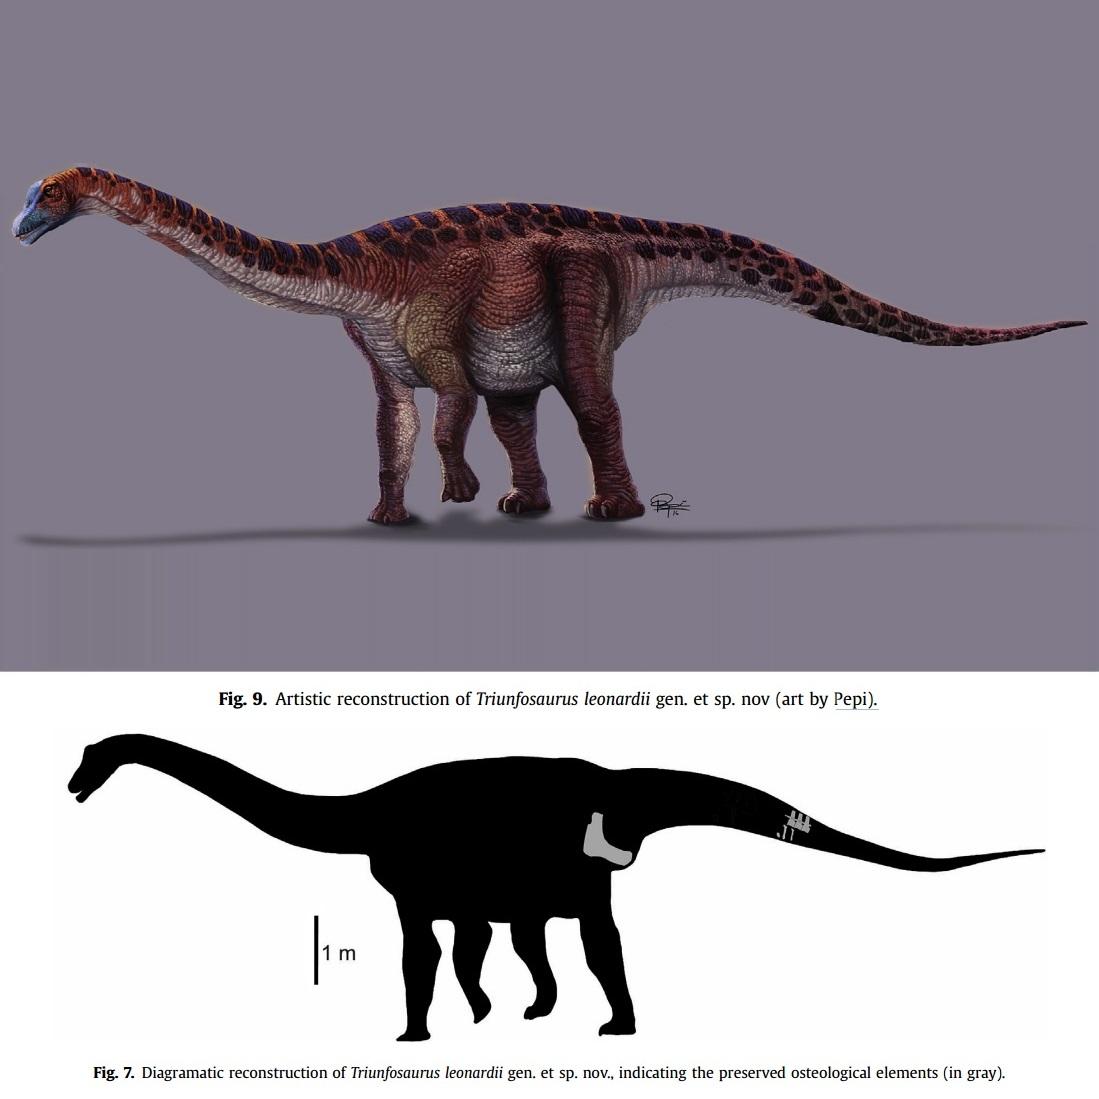 Paleo discoveries of 2017. Triunfosaurus_leonardii-novataxa_2017-Carvalho-Salgado-Lindoso-Ara%25C3%25BAjo-J%25C3%25BAnior-Nogueira-et-Soares_paleoArt_Pepi